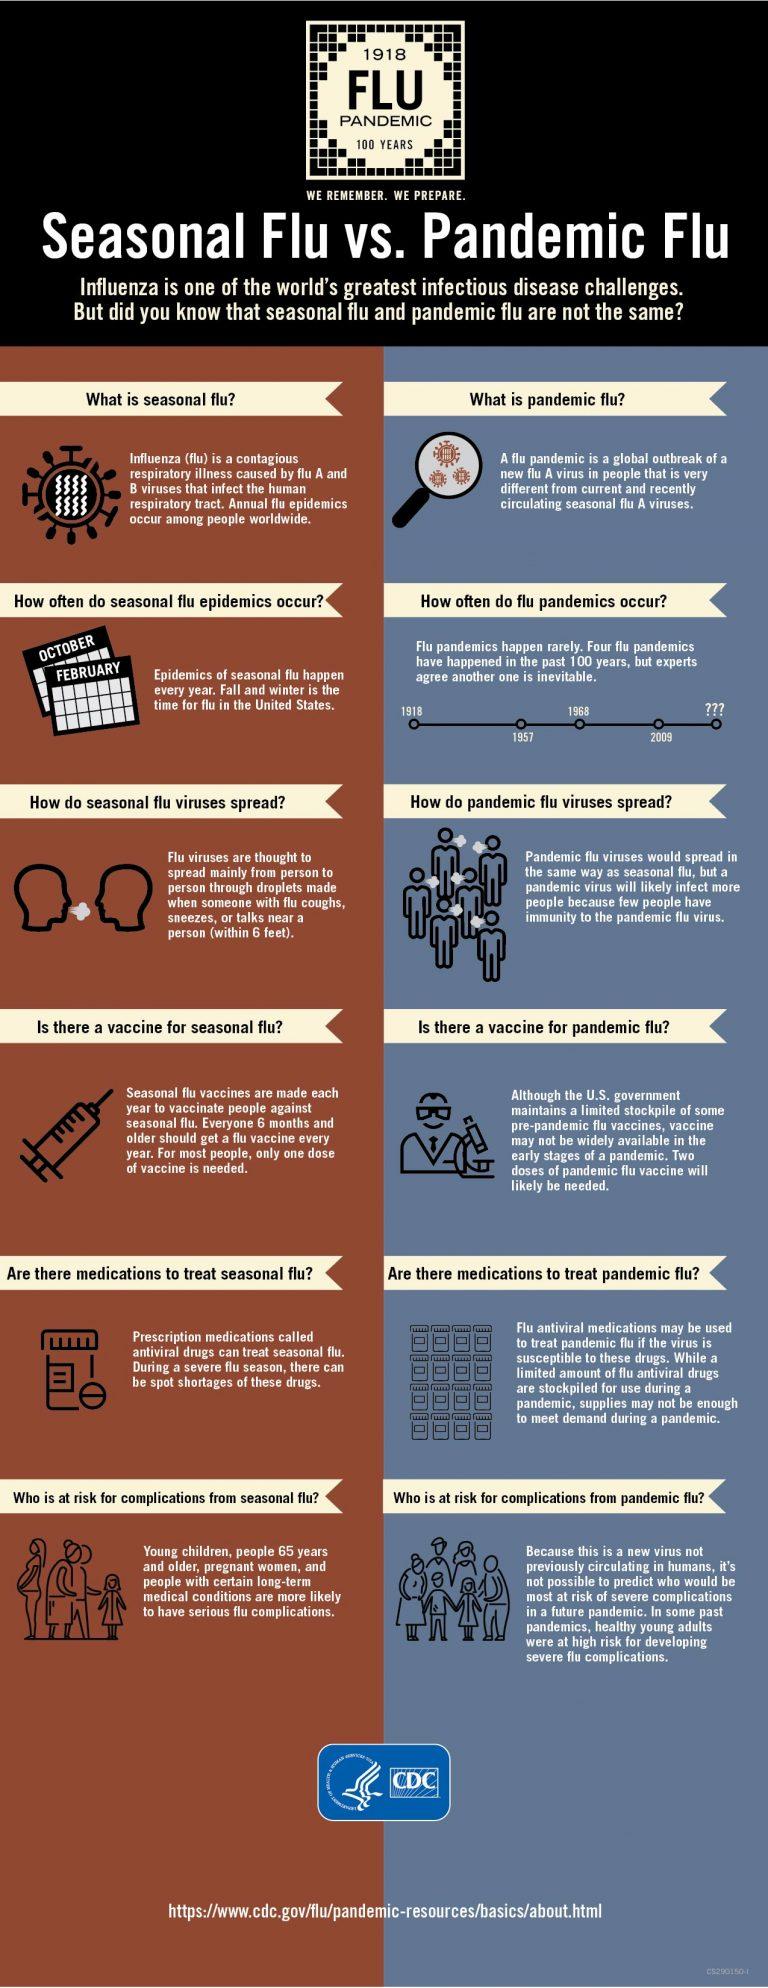 seasonal-vs-pandemic-flu-infographic by the CDC